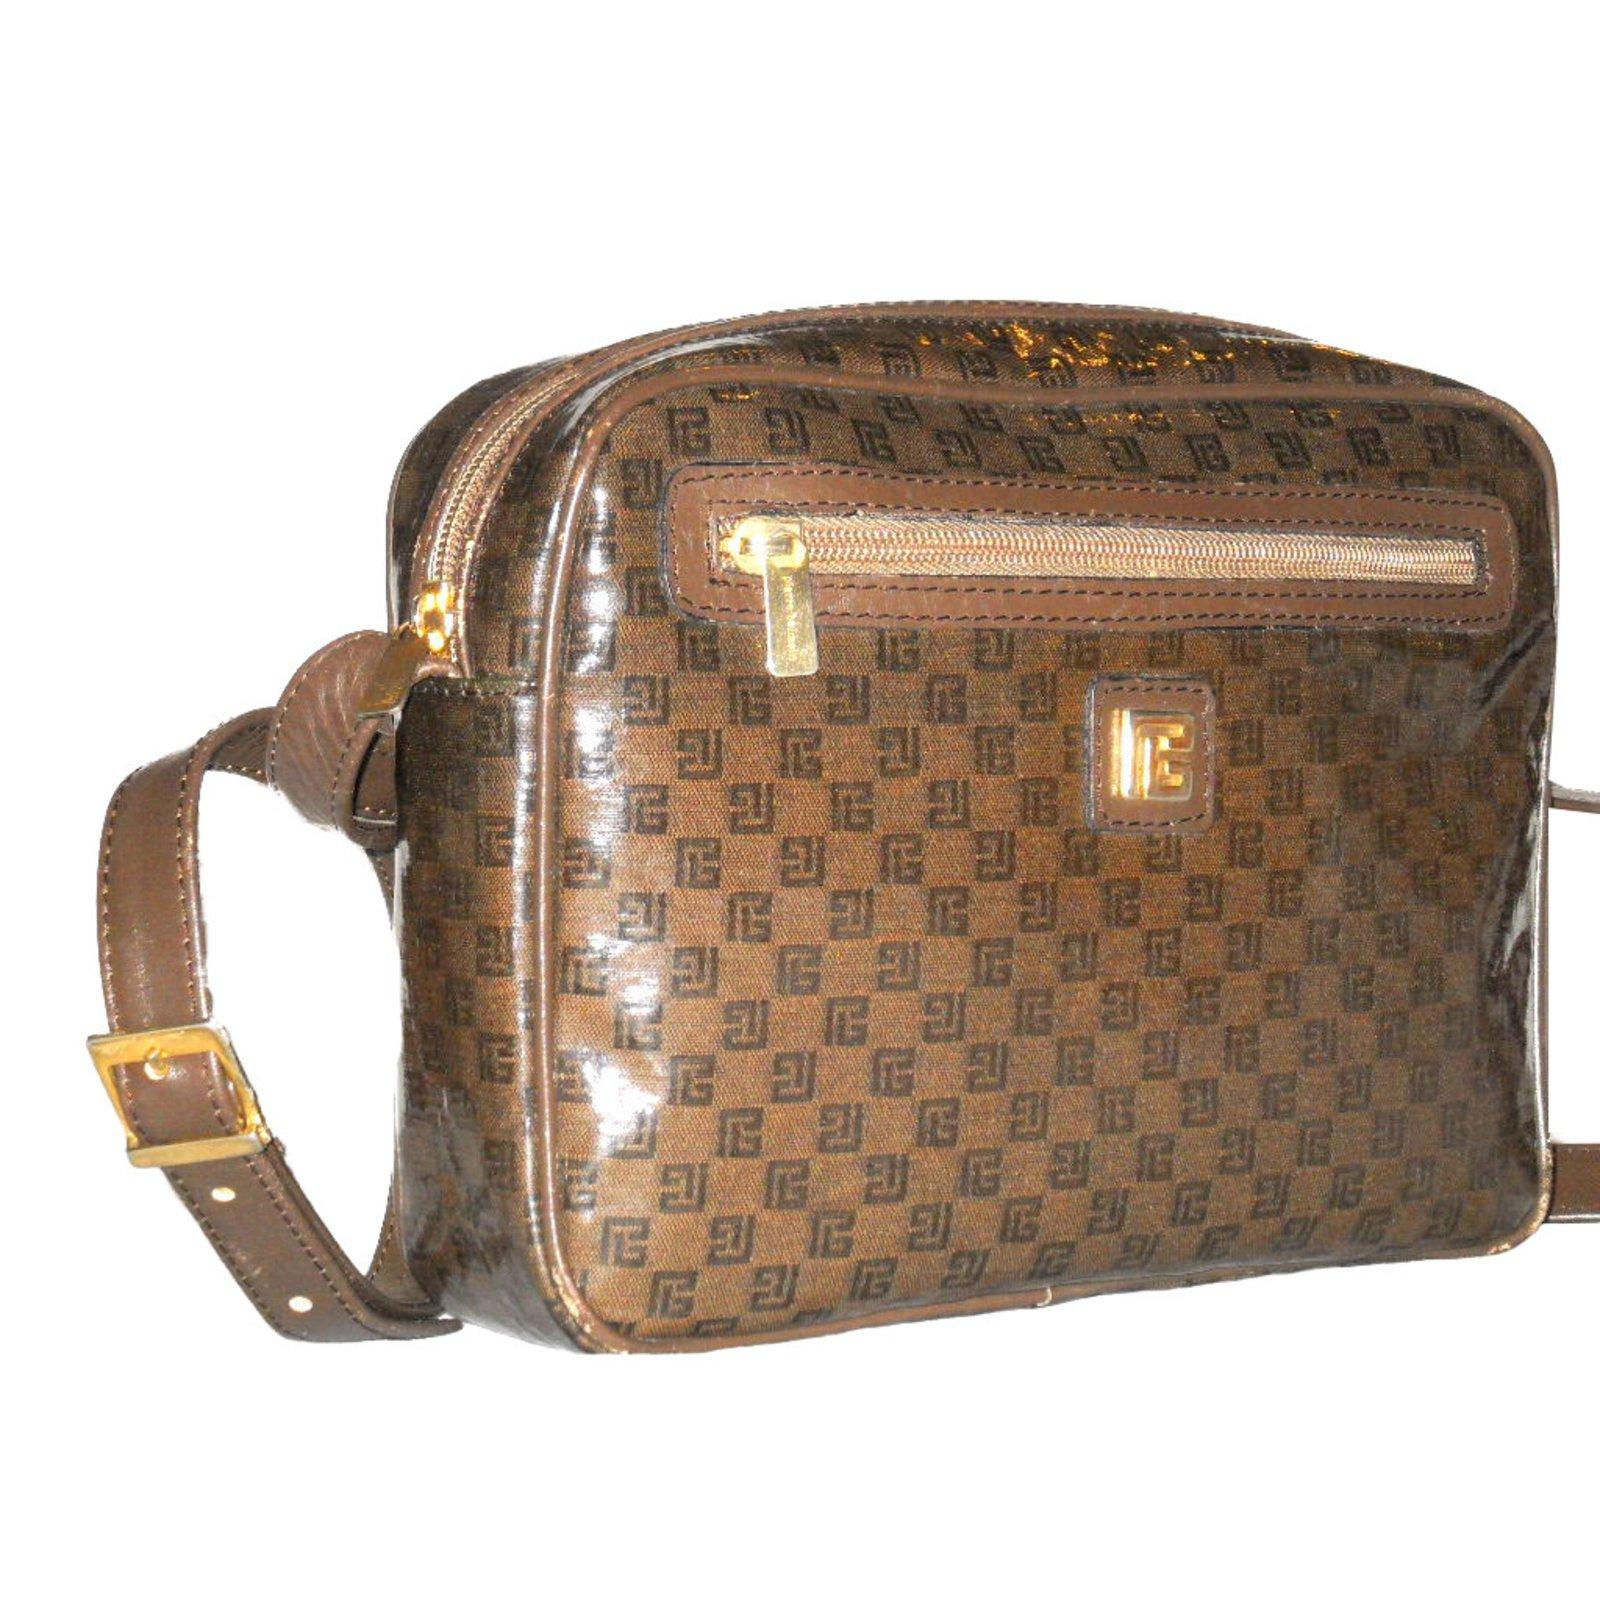 Pierre Balmain Handbags Leather Cloth Plastic Brown Ref 81208 Joli Closet